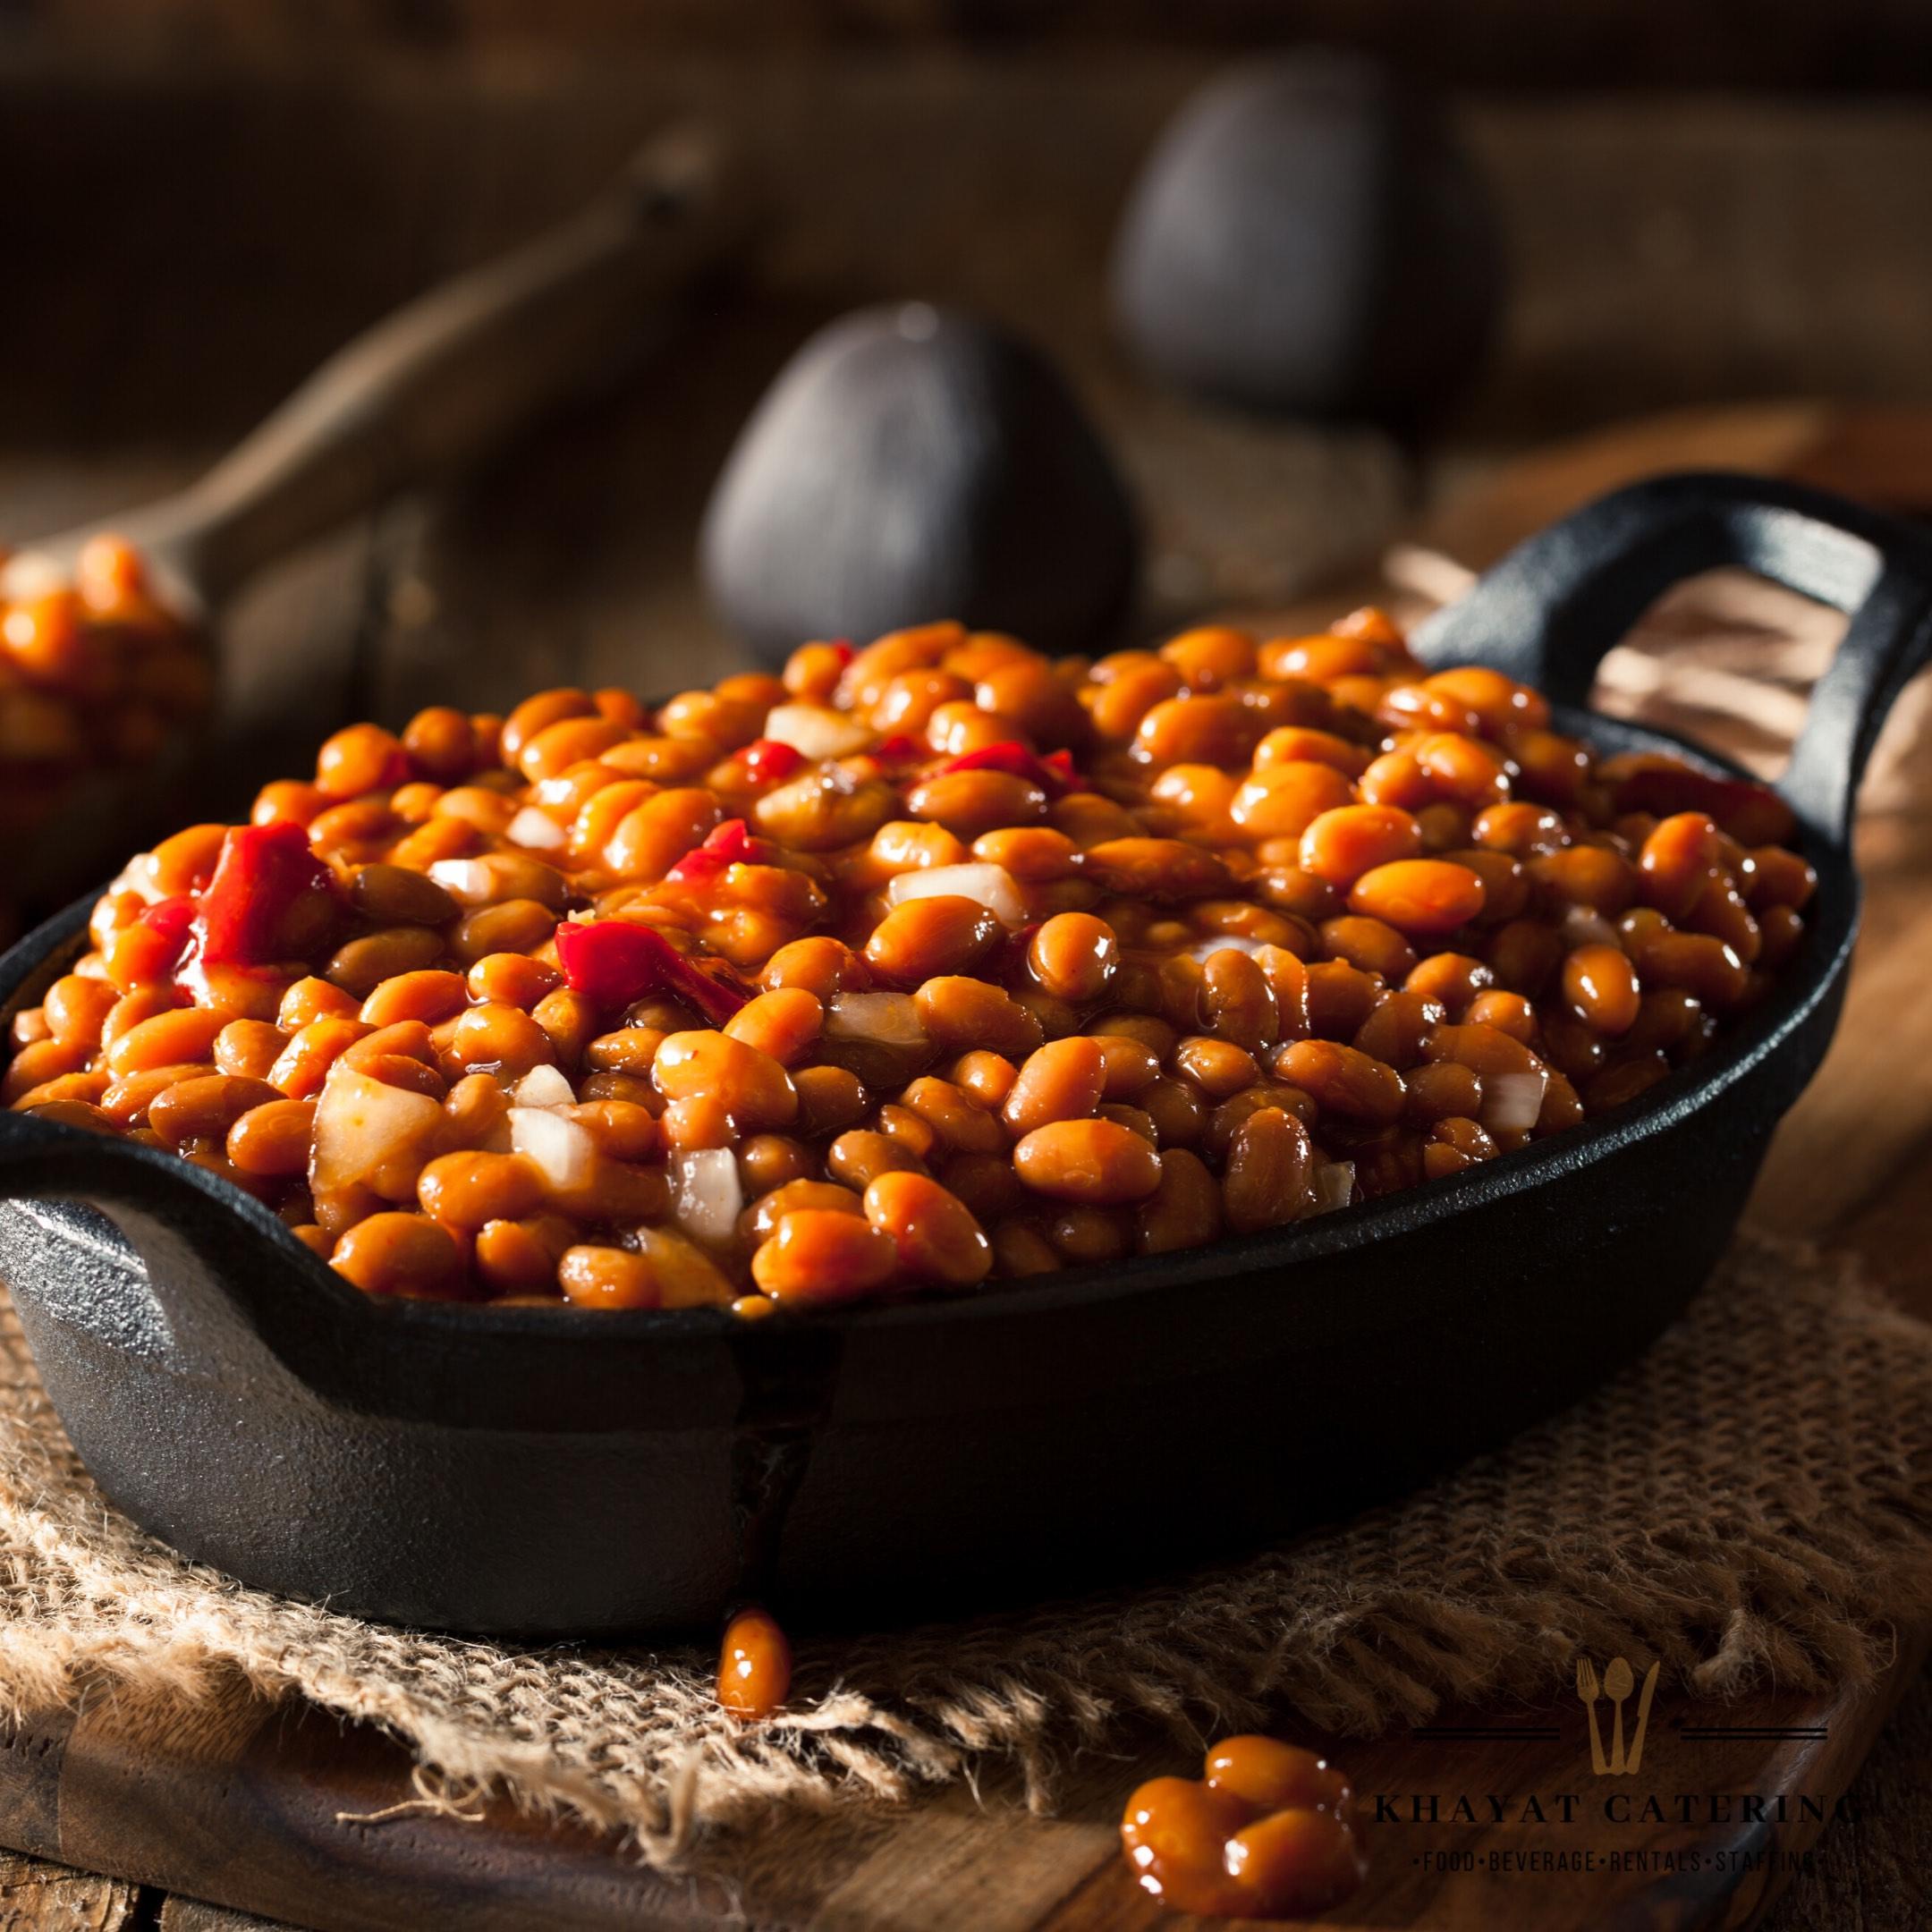 Khayat Catering baked beans